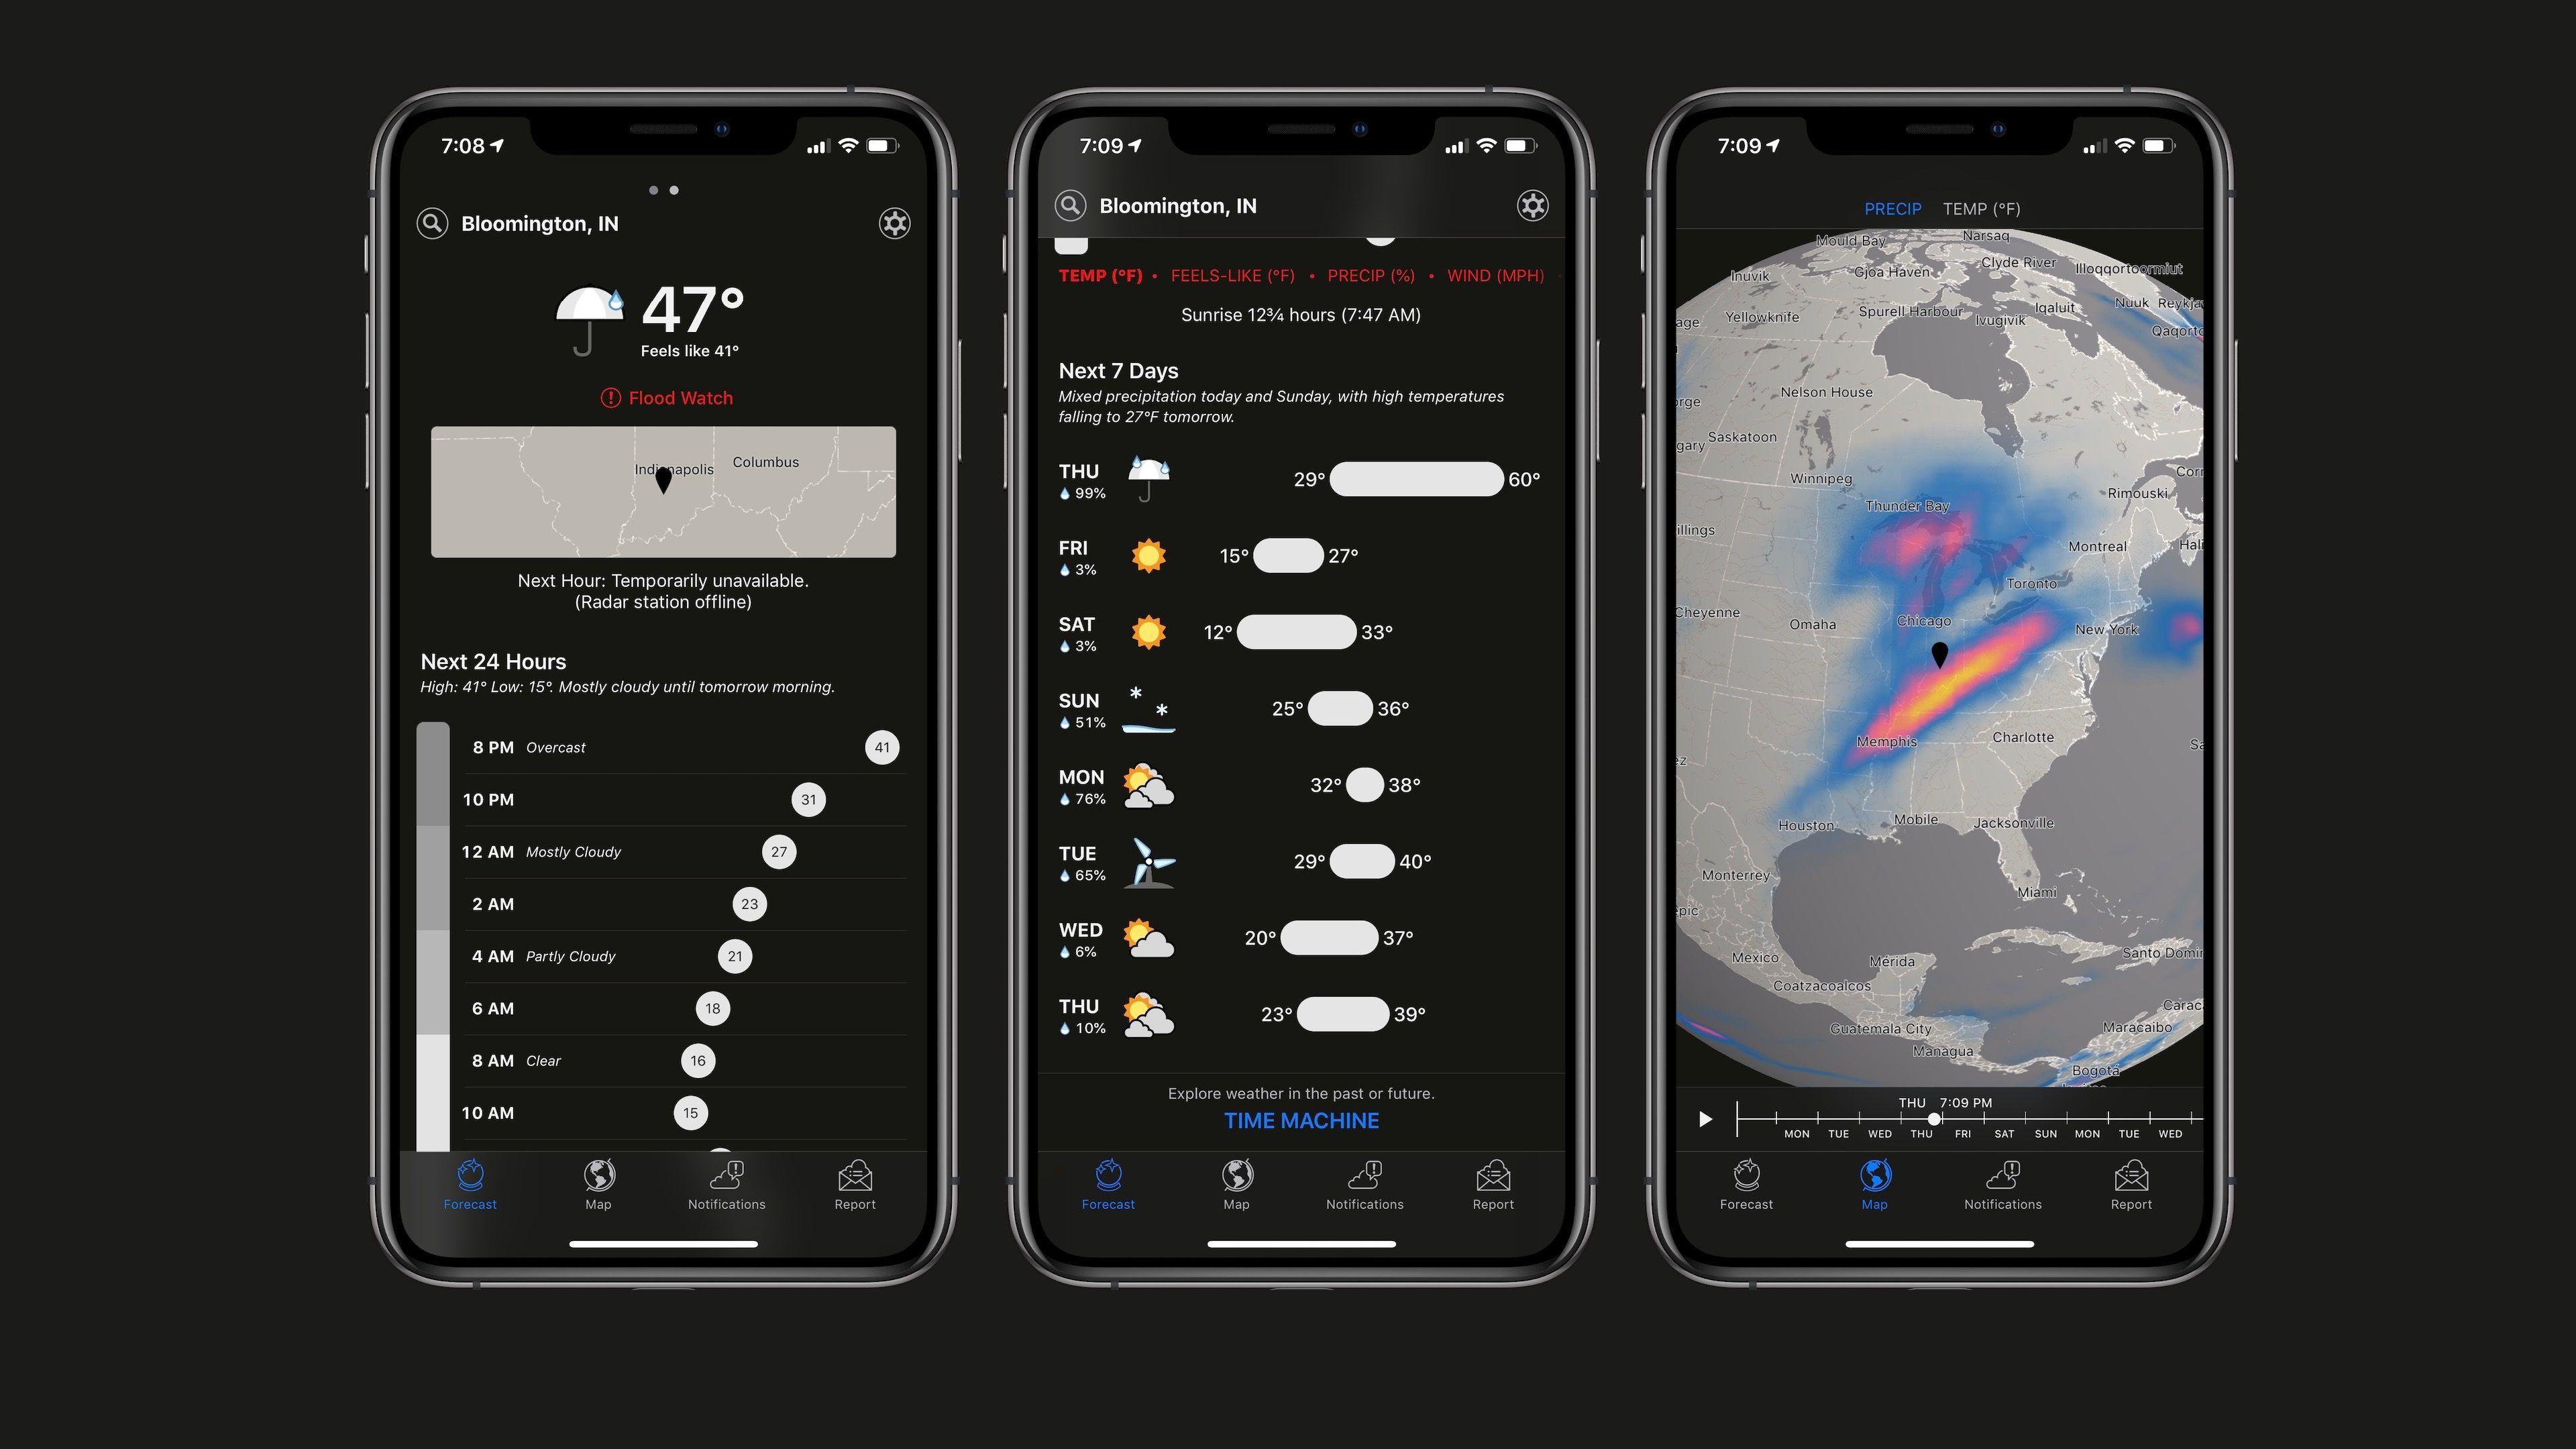 Dark Sky Weather App On Ios Adds Slick New Dark Mode In Latest Update Weather Geek Gadgets New Gadgets